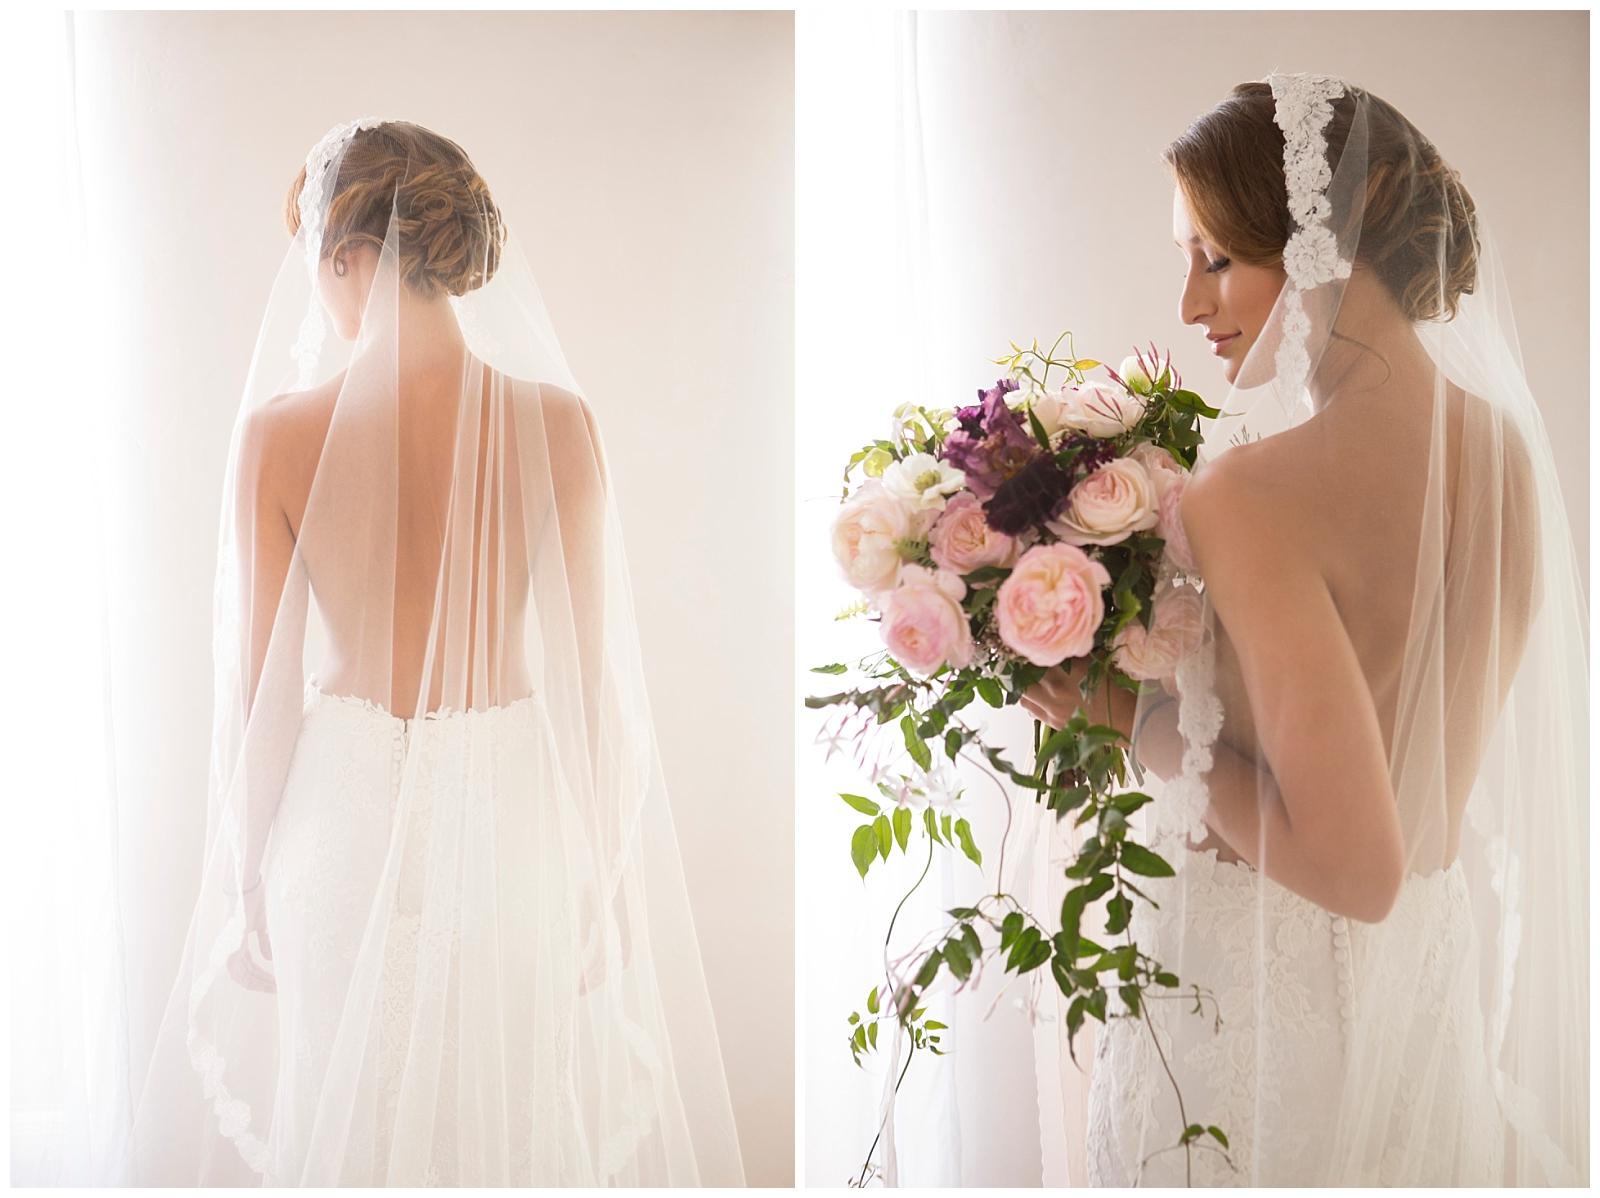 Veil-Inspiration-Epiphany-Wedding-Dress-Boudoir-Carol-Oliva-Photography.jpg